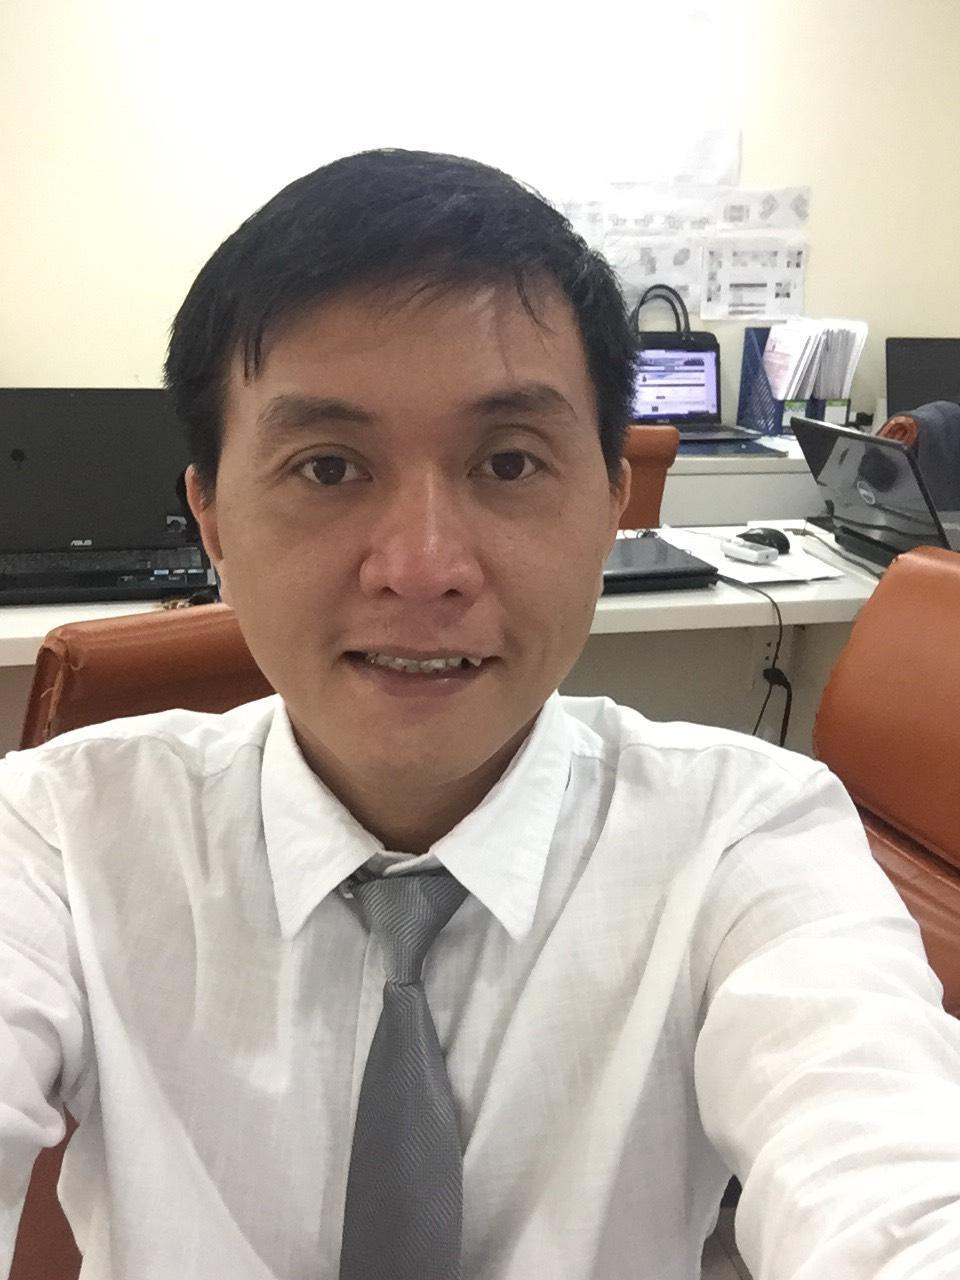 Phan Kim Long